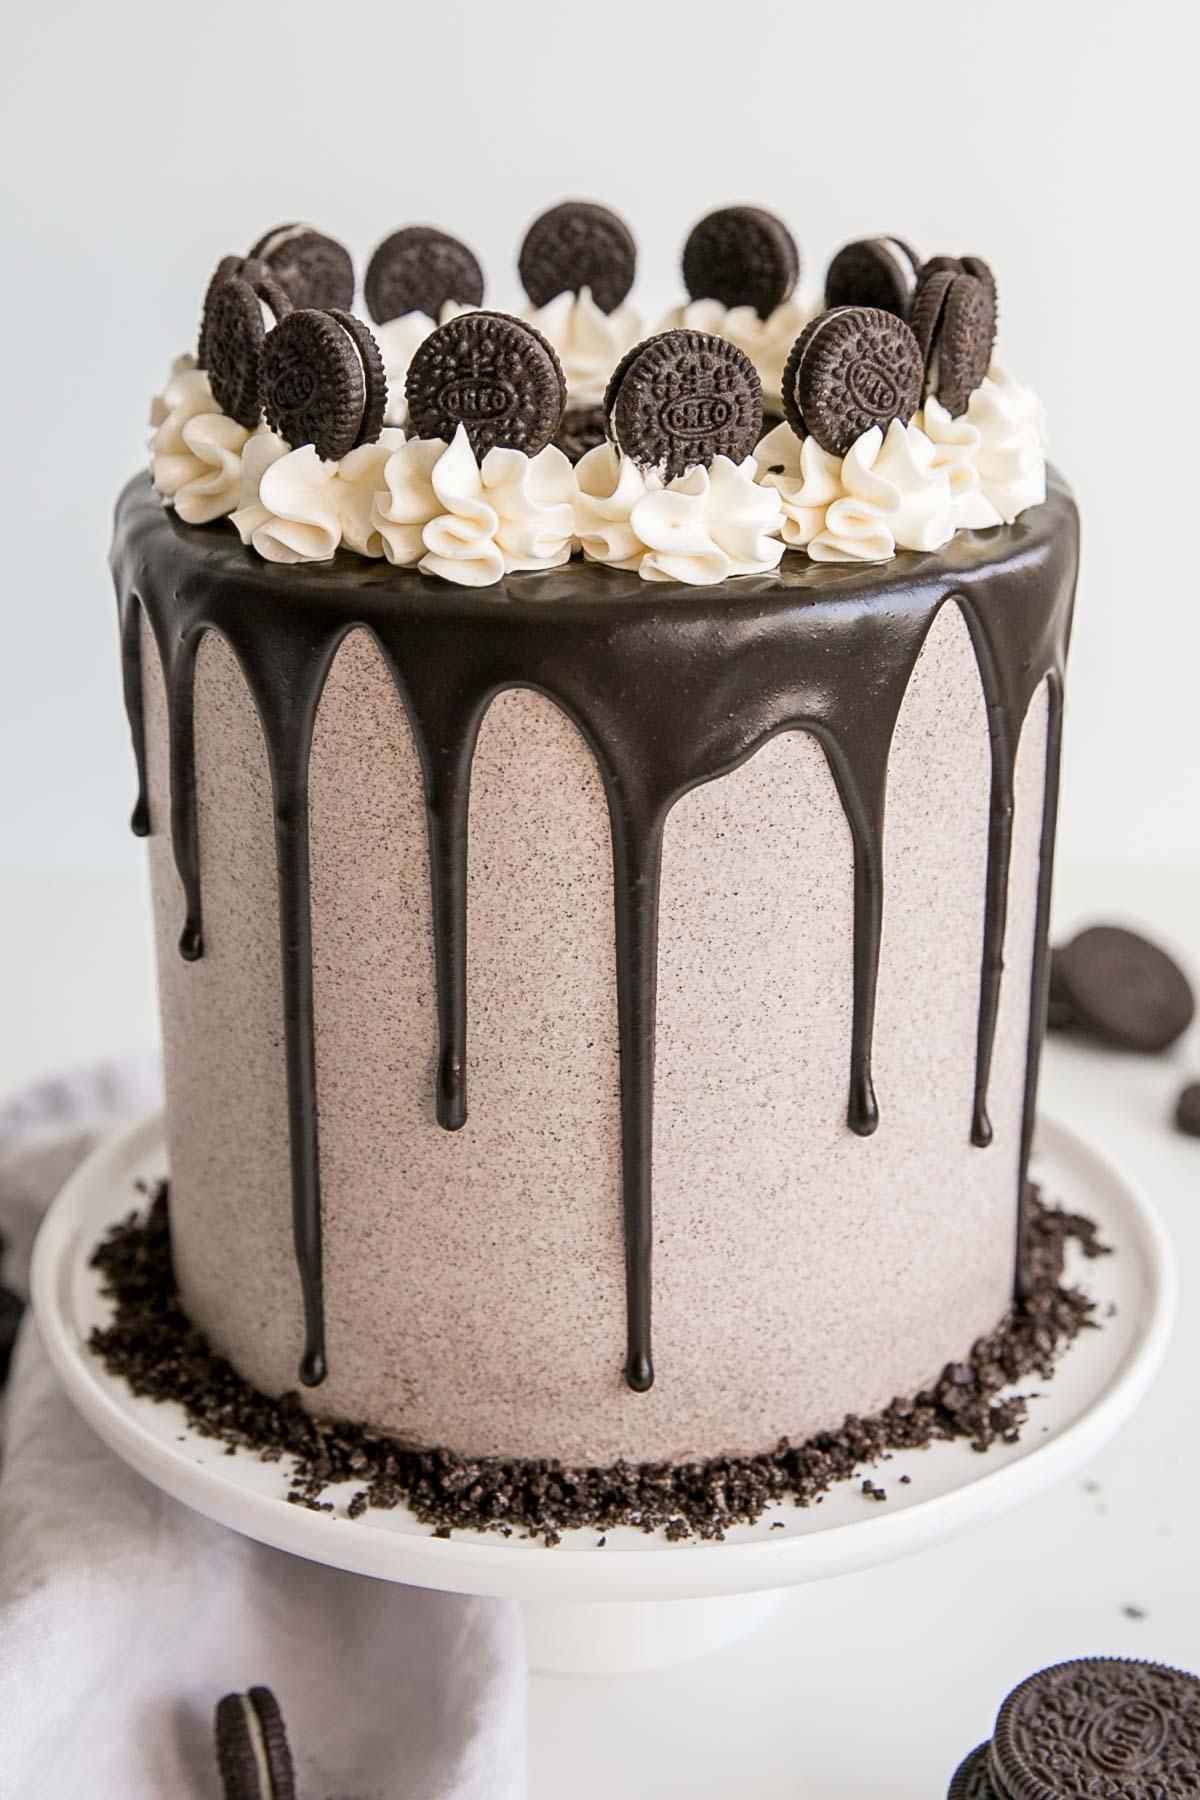 Six layer Oreo cake with Oreo buttercream and a dark chocolate ganache.